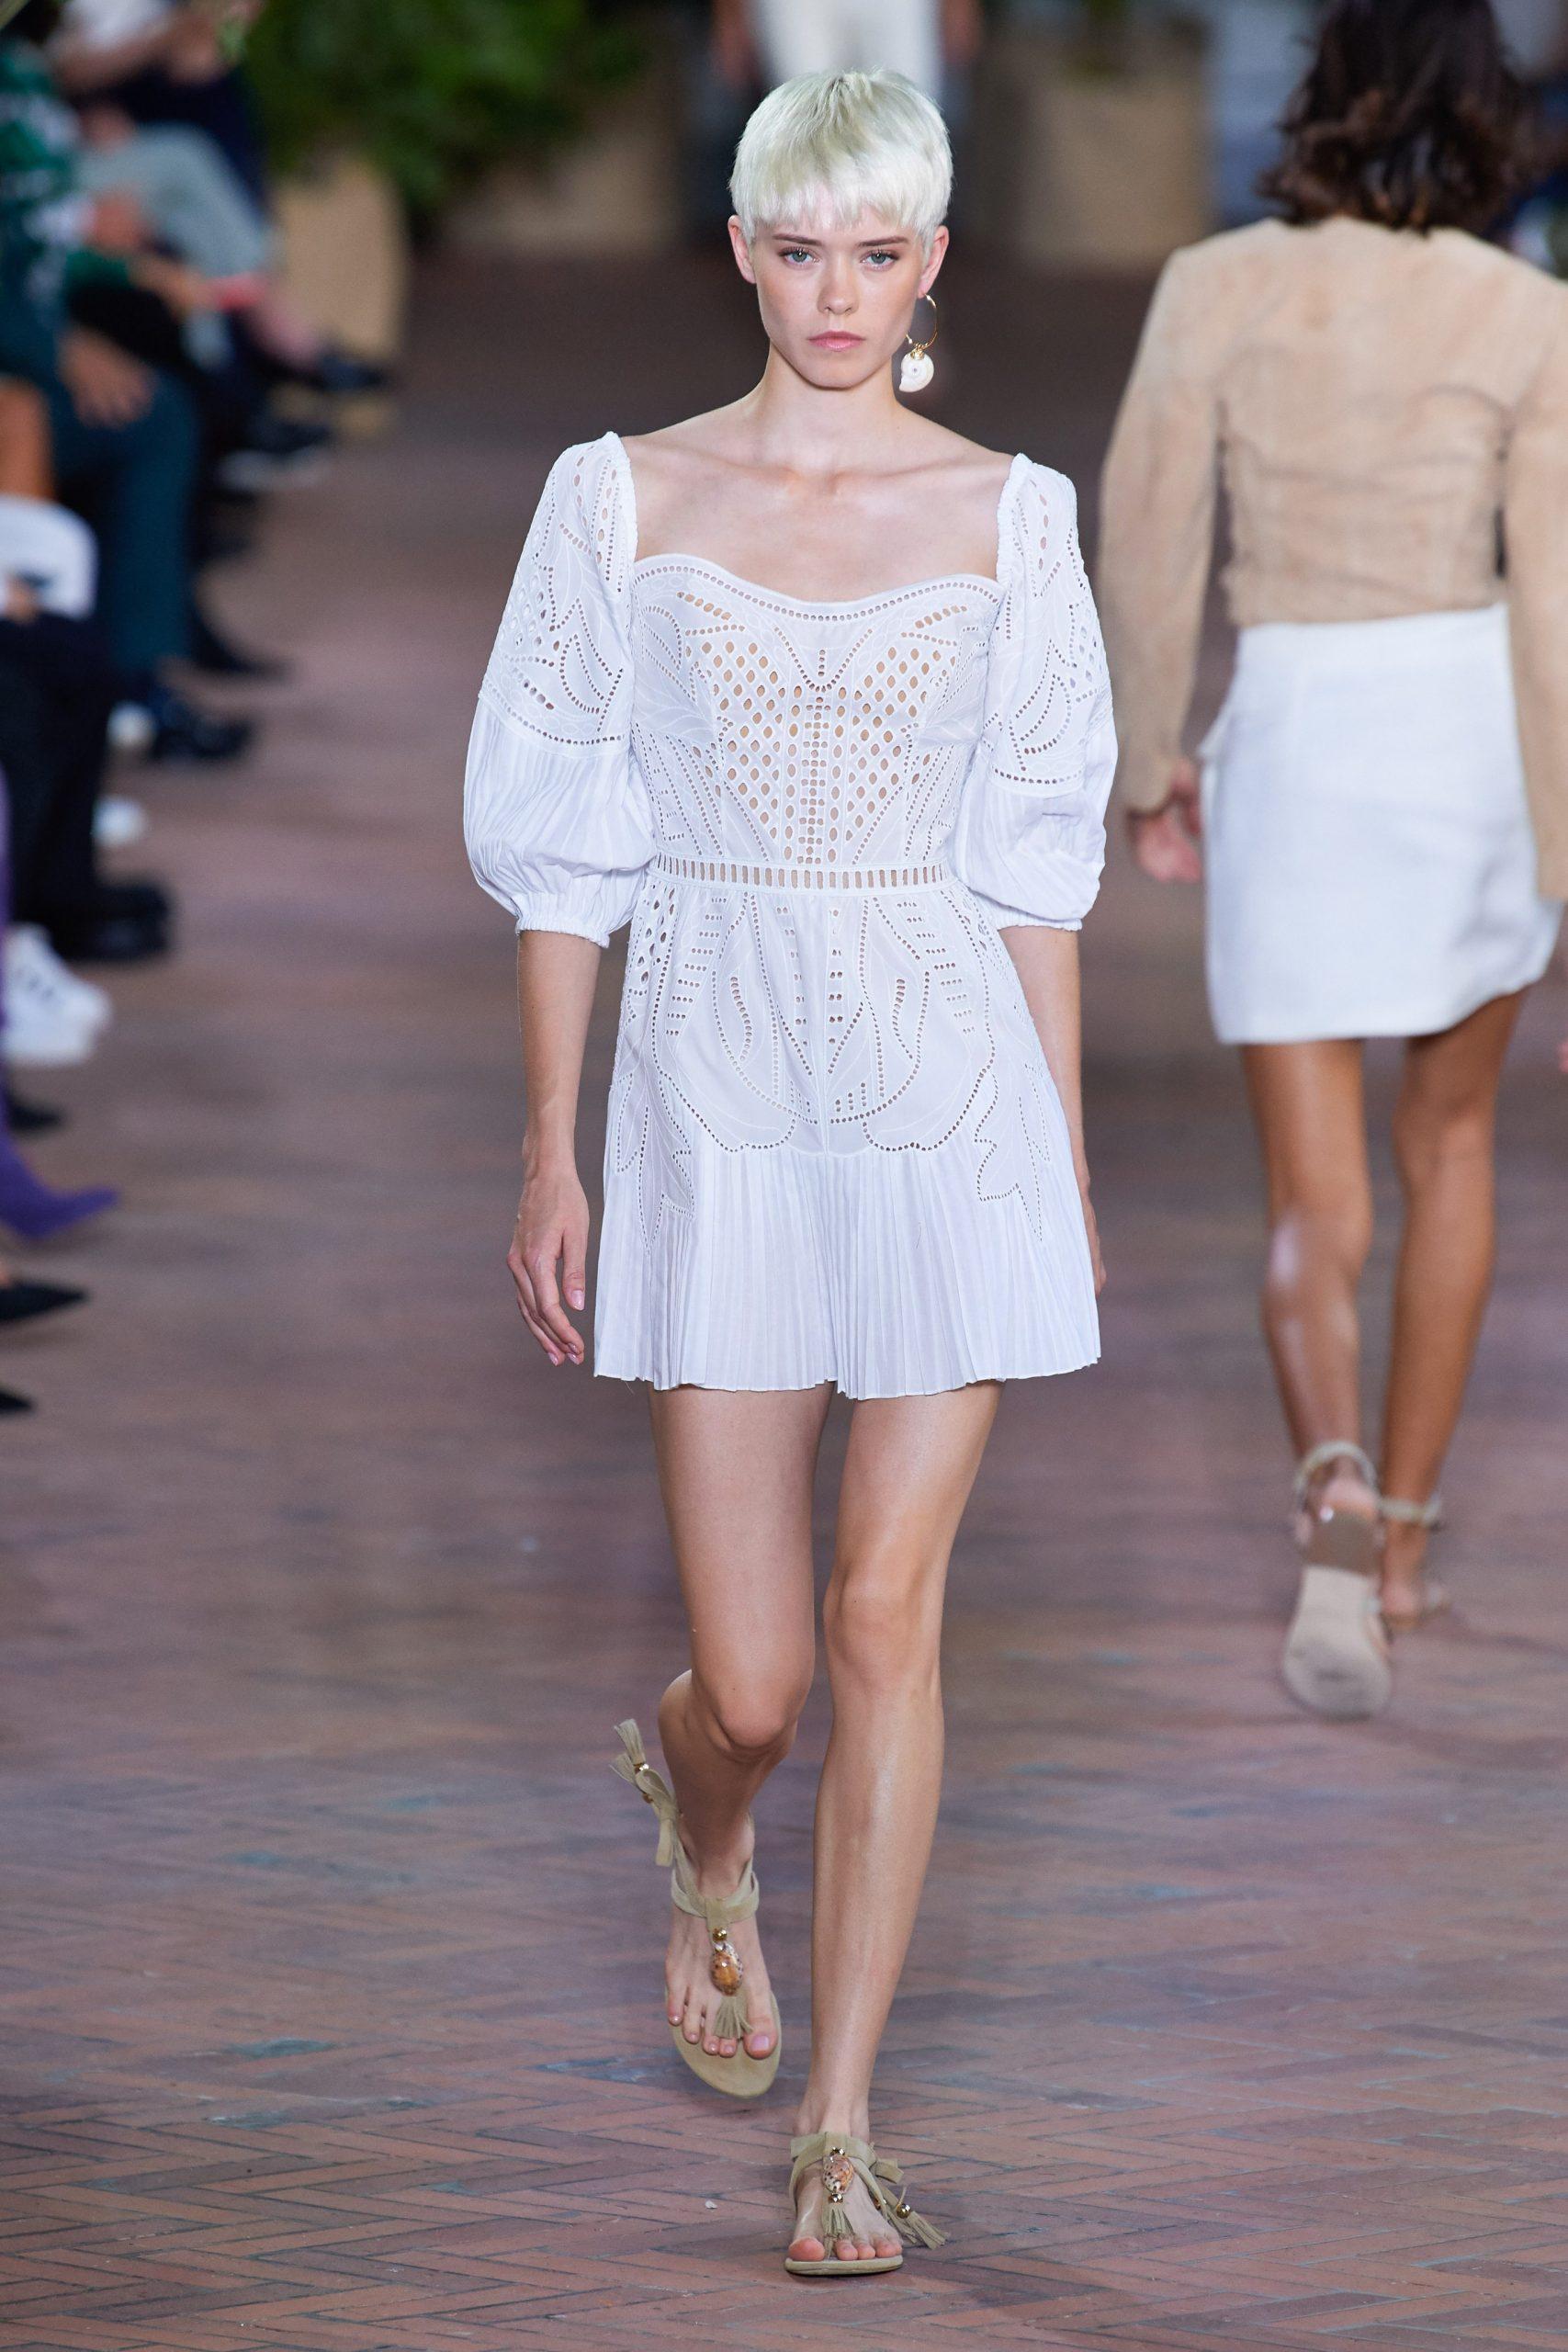 Alberta Ferretti Spring 2021, vestidos de novia para mujeres alternativas - Wedding Hub - 06